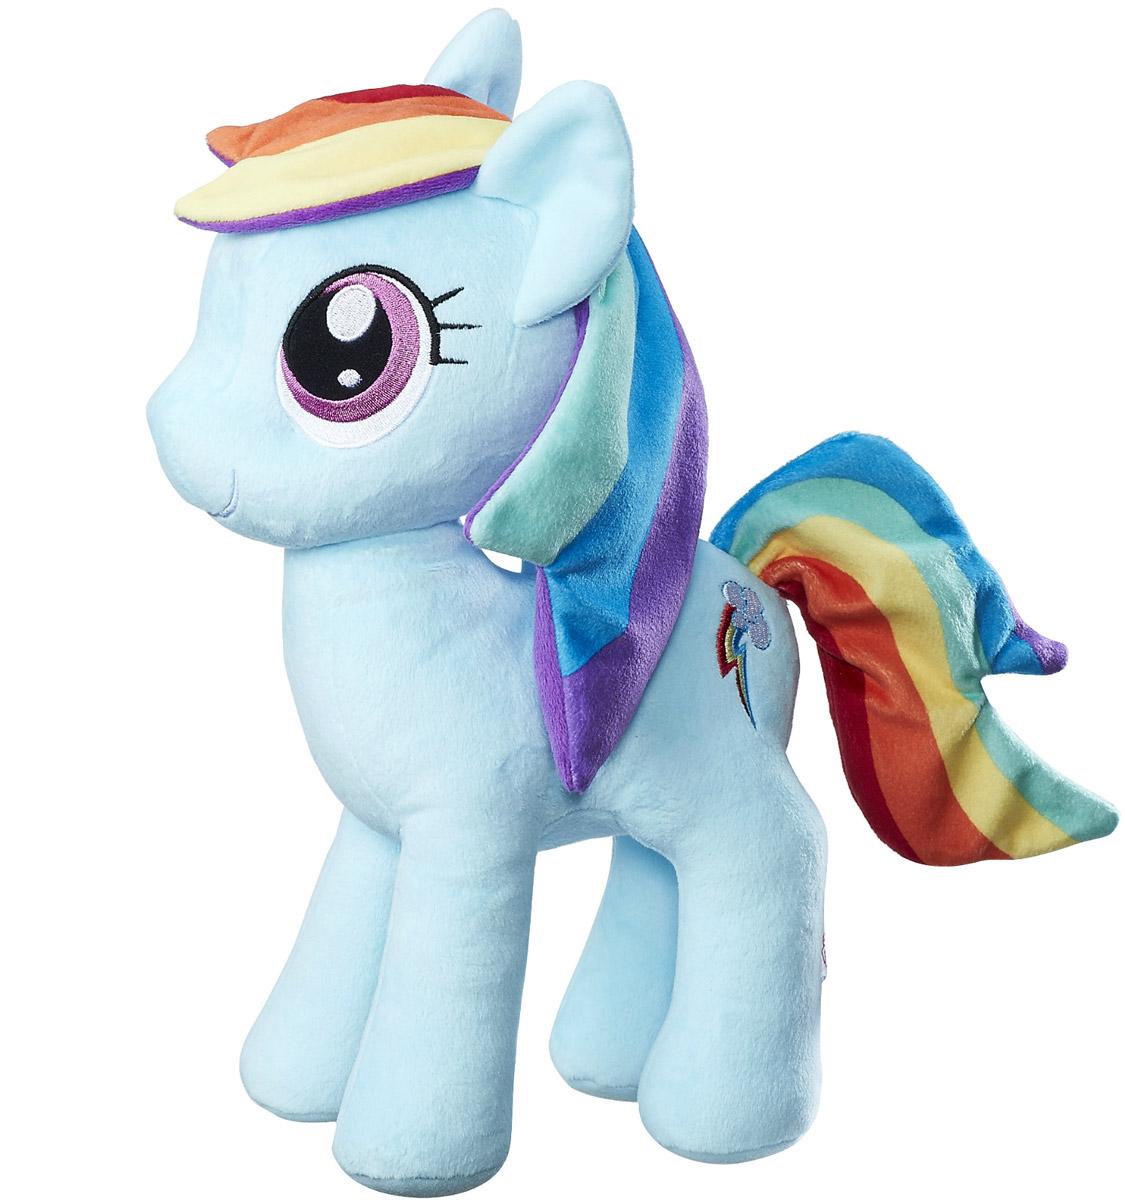 My Little Pony Мягкая игрушка Rainbow Dash 30 см мульти пульти мягкая игрушка принцесса луна 18 см со звуком my little pony мульти пульти